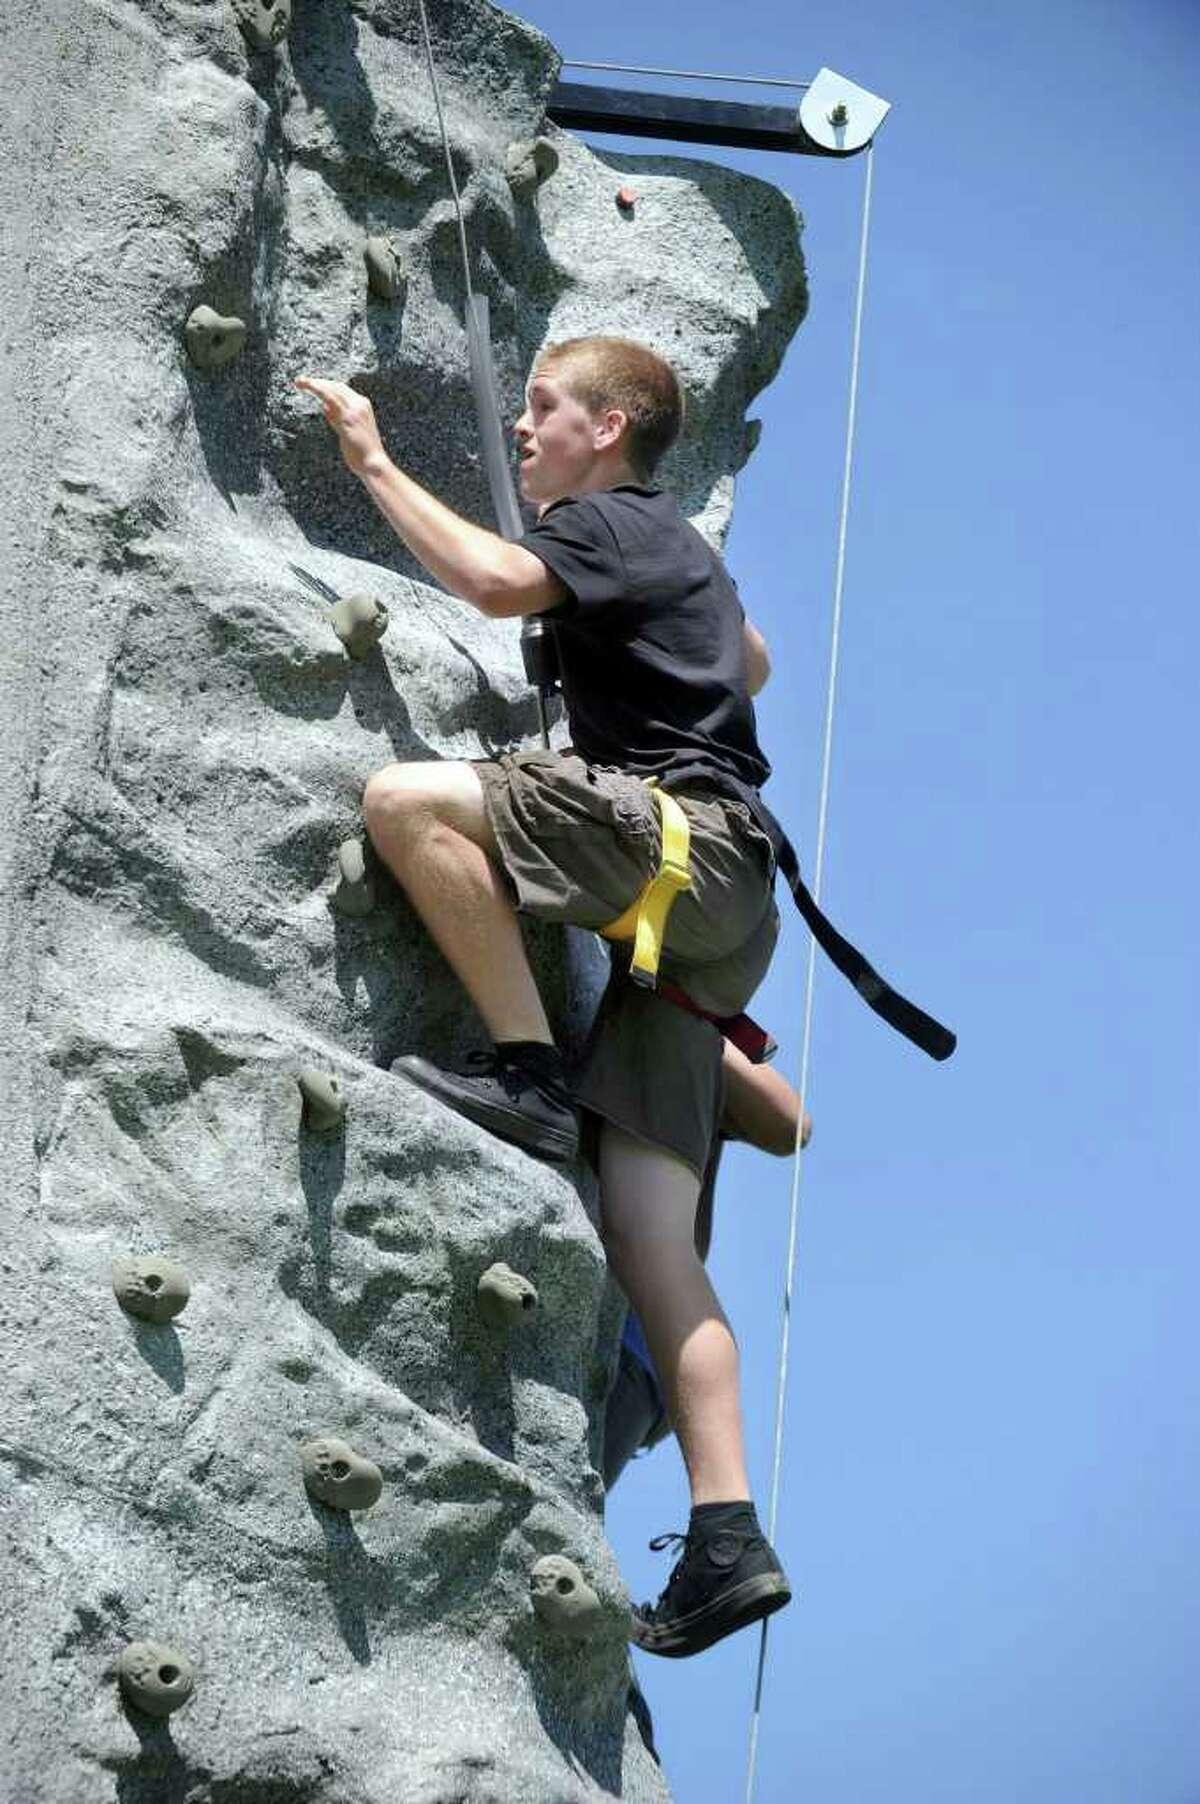 Josh Tamburino, 16, climbs the rock wall at Bethel High School during an ROTC activity, Thursday, June 2, 2011.